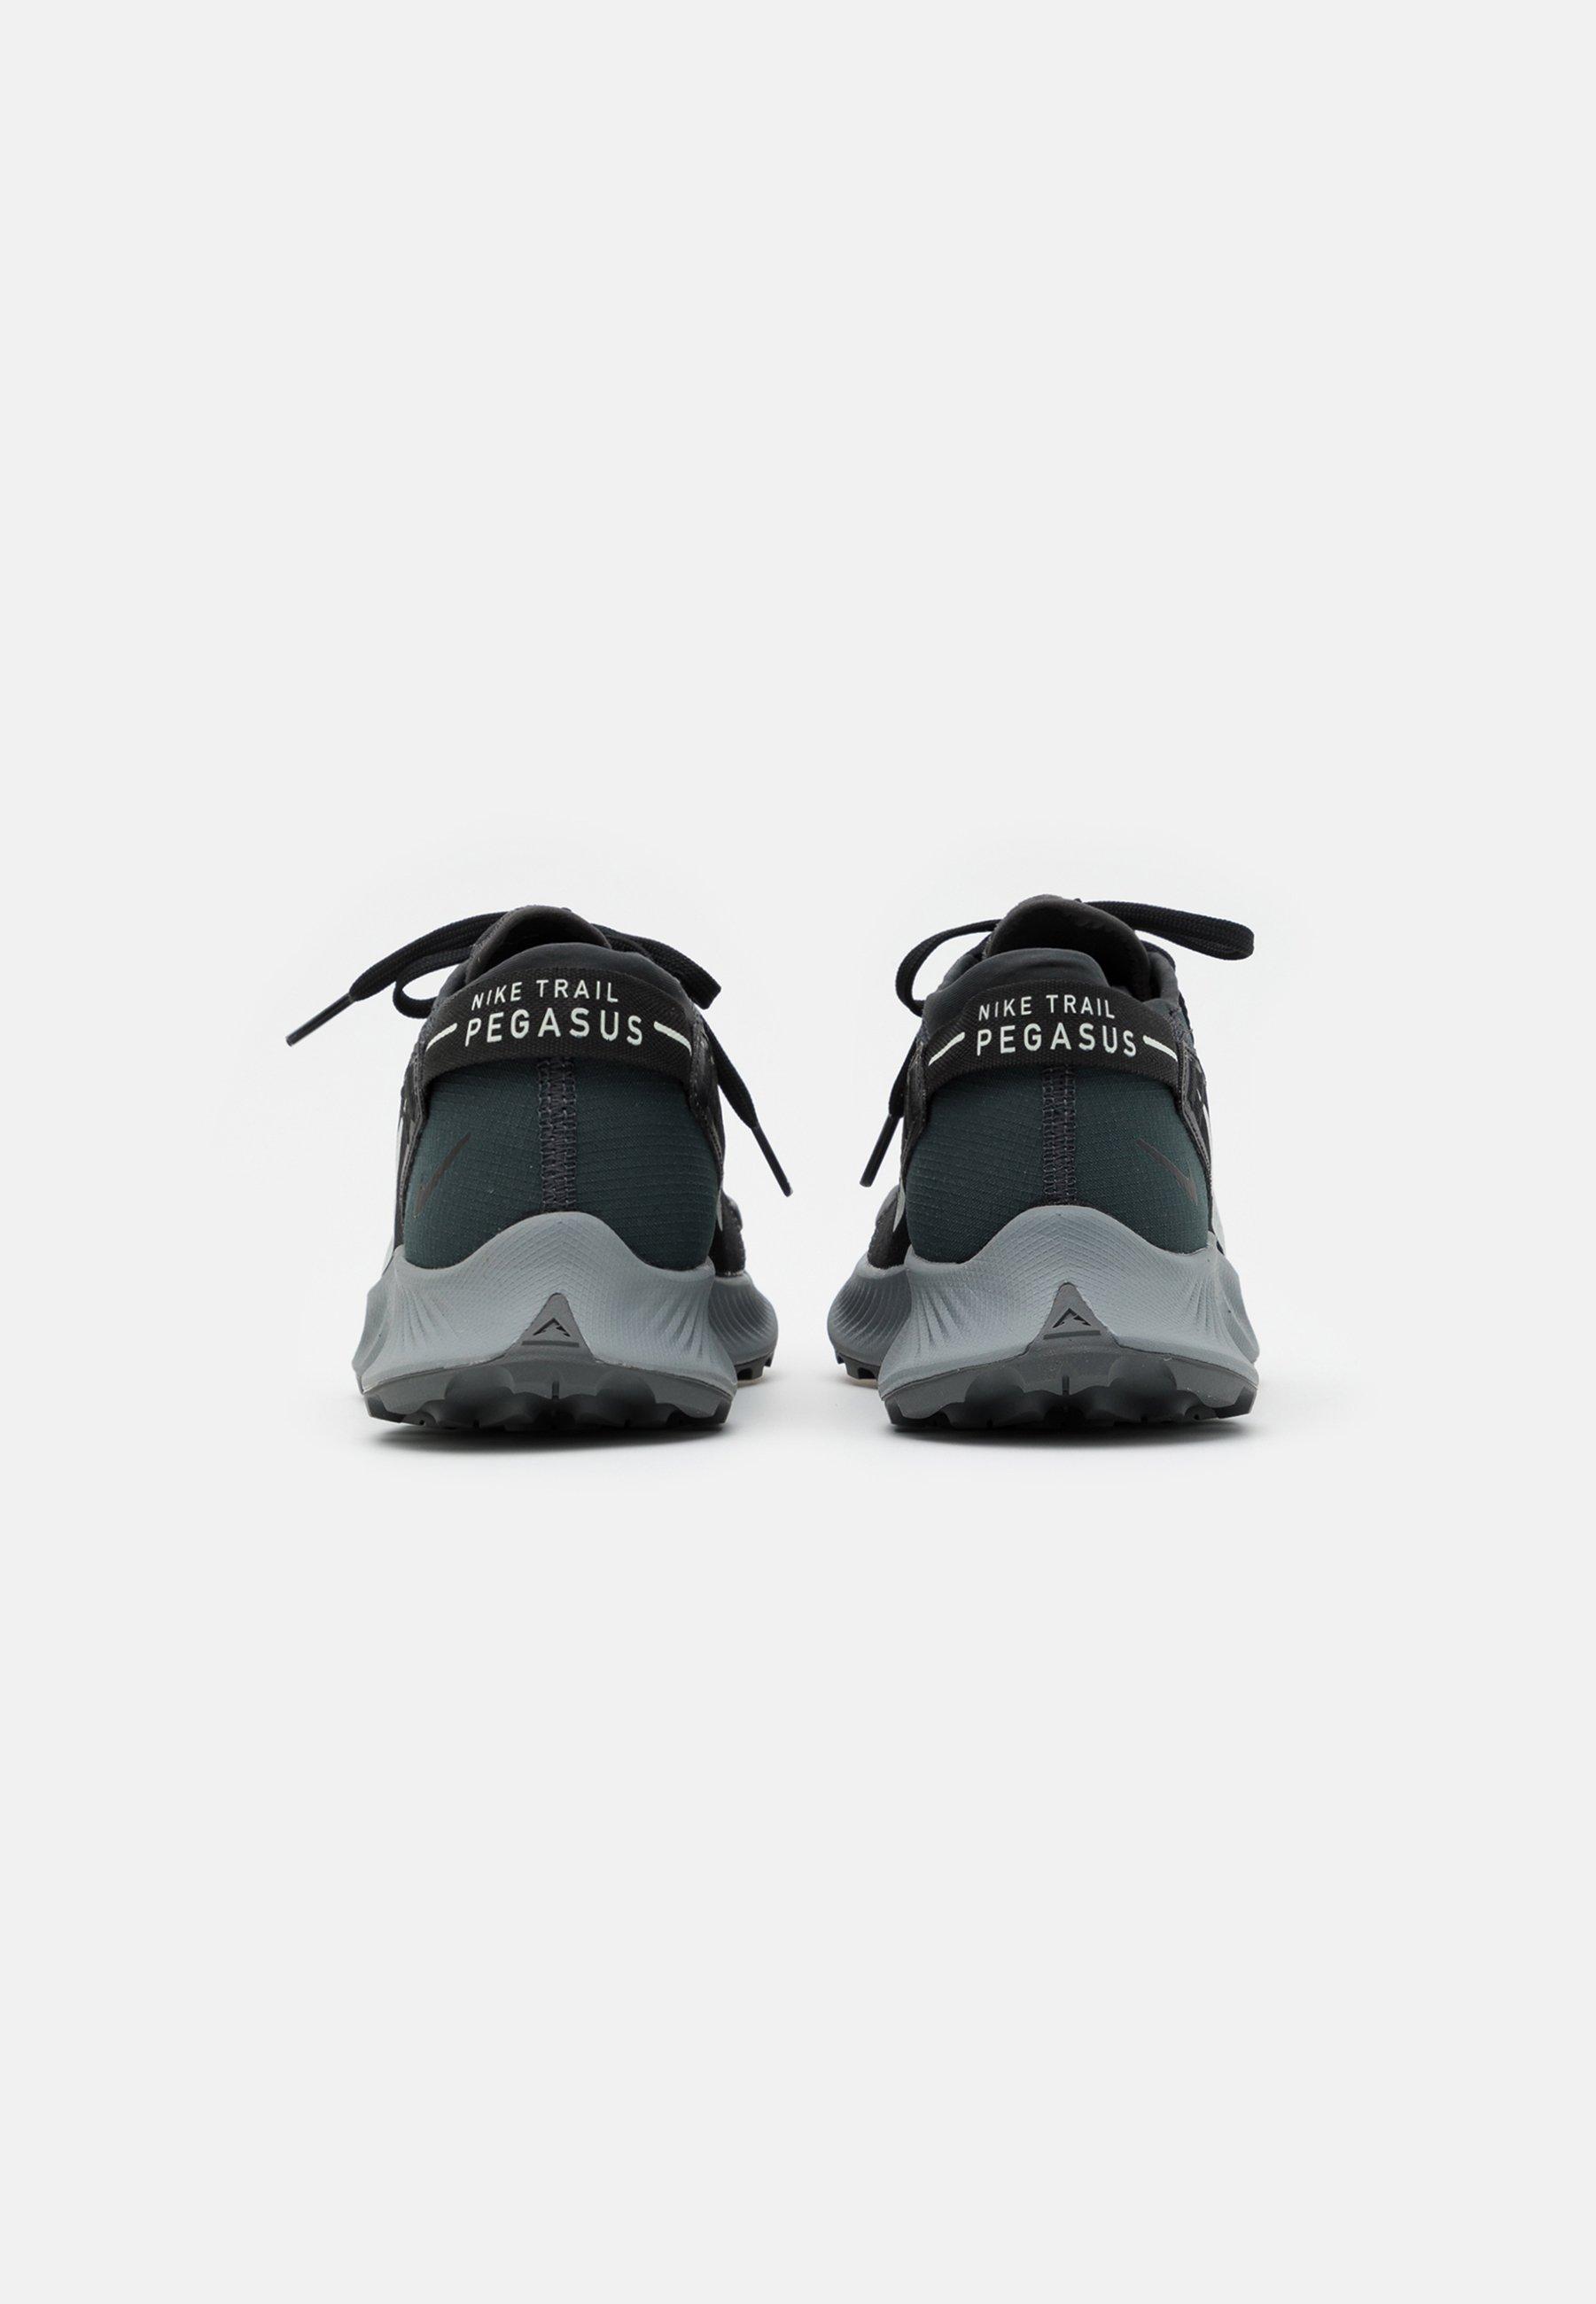 Recommend Cheap Online Cheapest Women's Shoes Nike Performance PEGASUS TRAIL 2 Trail running shoes black/spruce aura/dark smoke grey V5pMwzV5D NjOU8SKpw